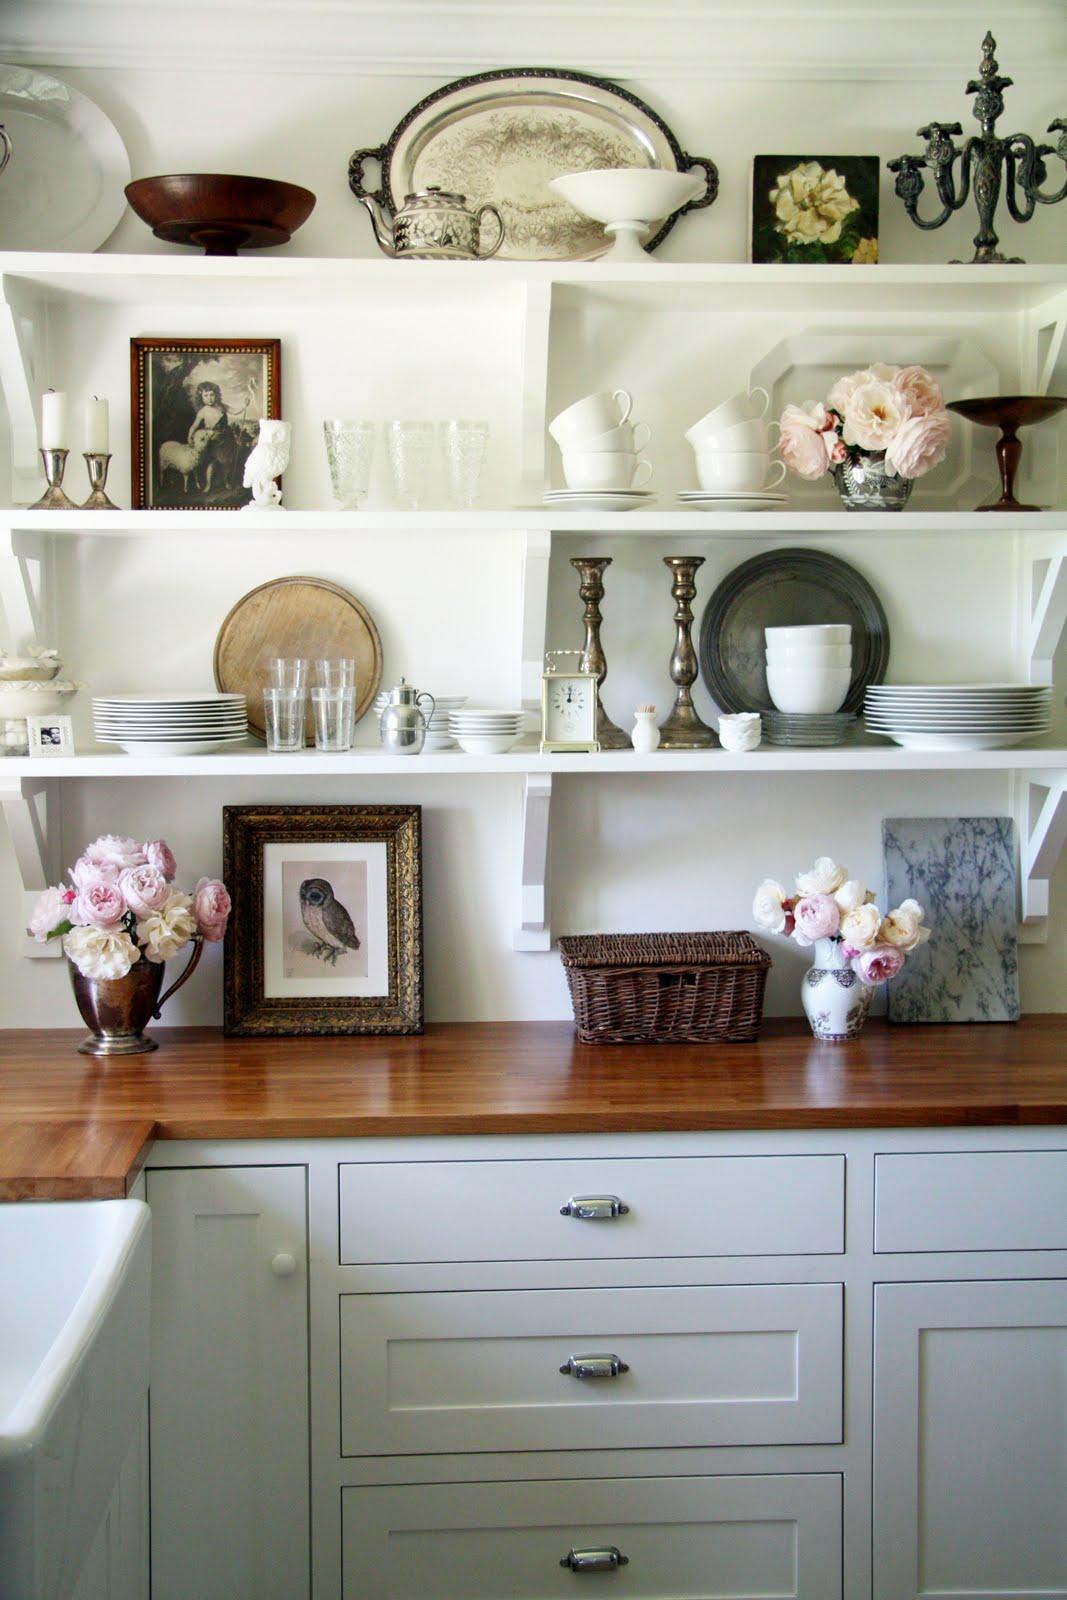 Kitchens with Open Shelves | 1067 x 1600 · 168 kB · jpeg | 1067 x 1600 · 168 kB · jpeg